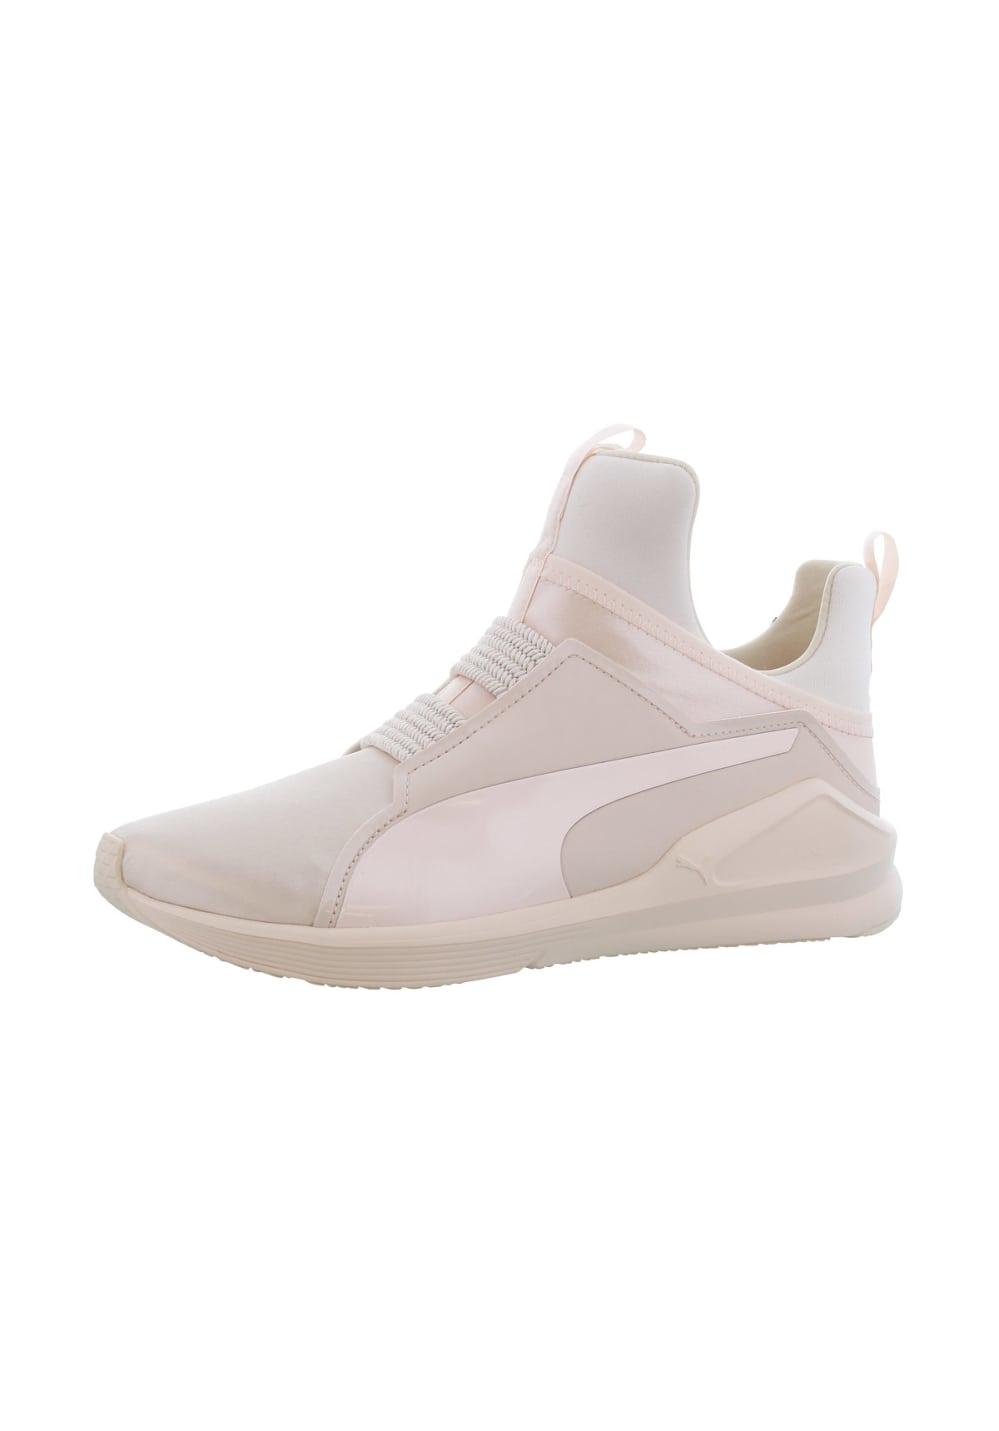 419ea81f57f0 Puma Fierce Satin EP - Fitness shoes for Women - Pink